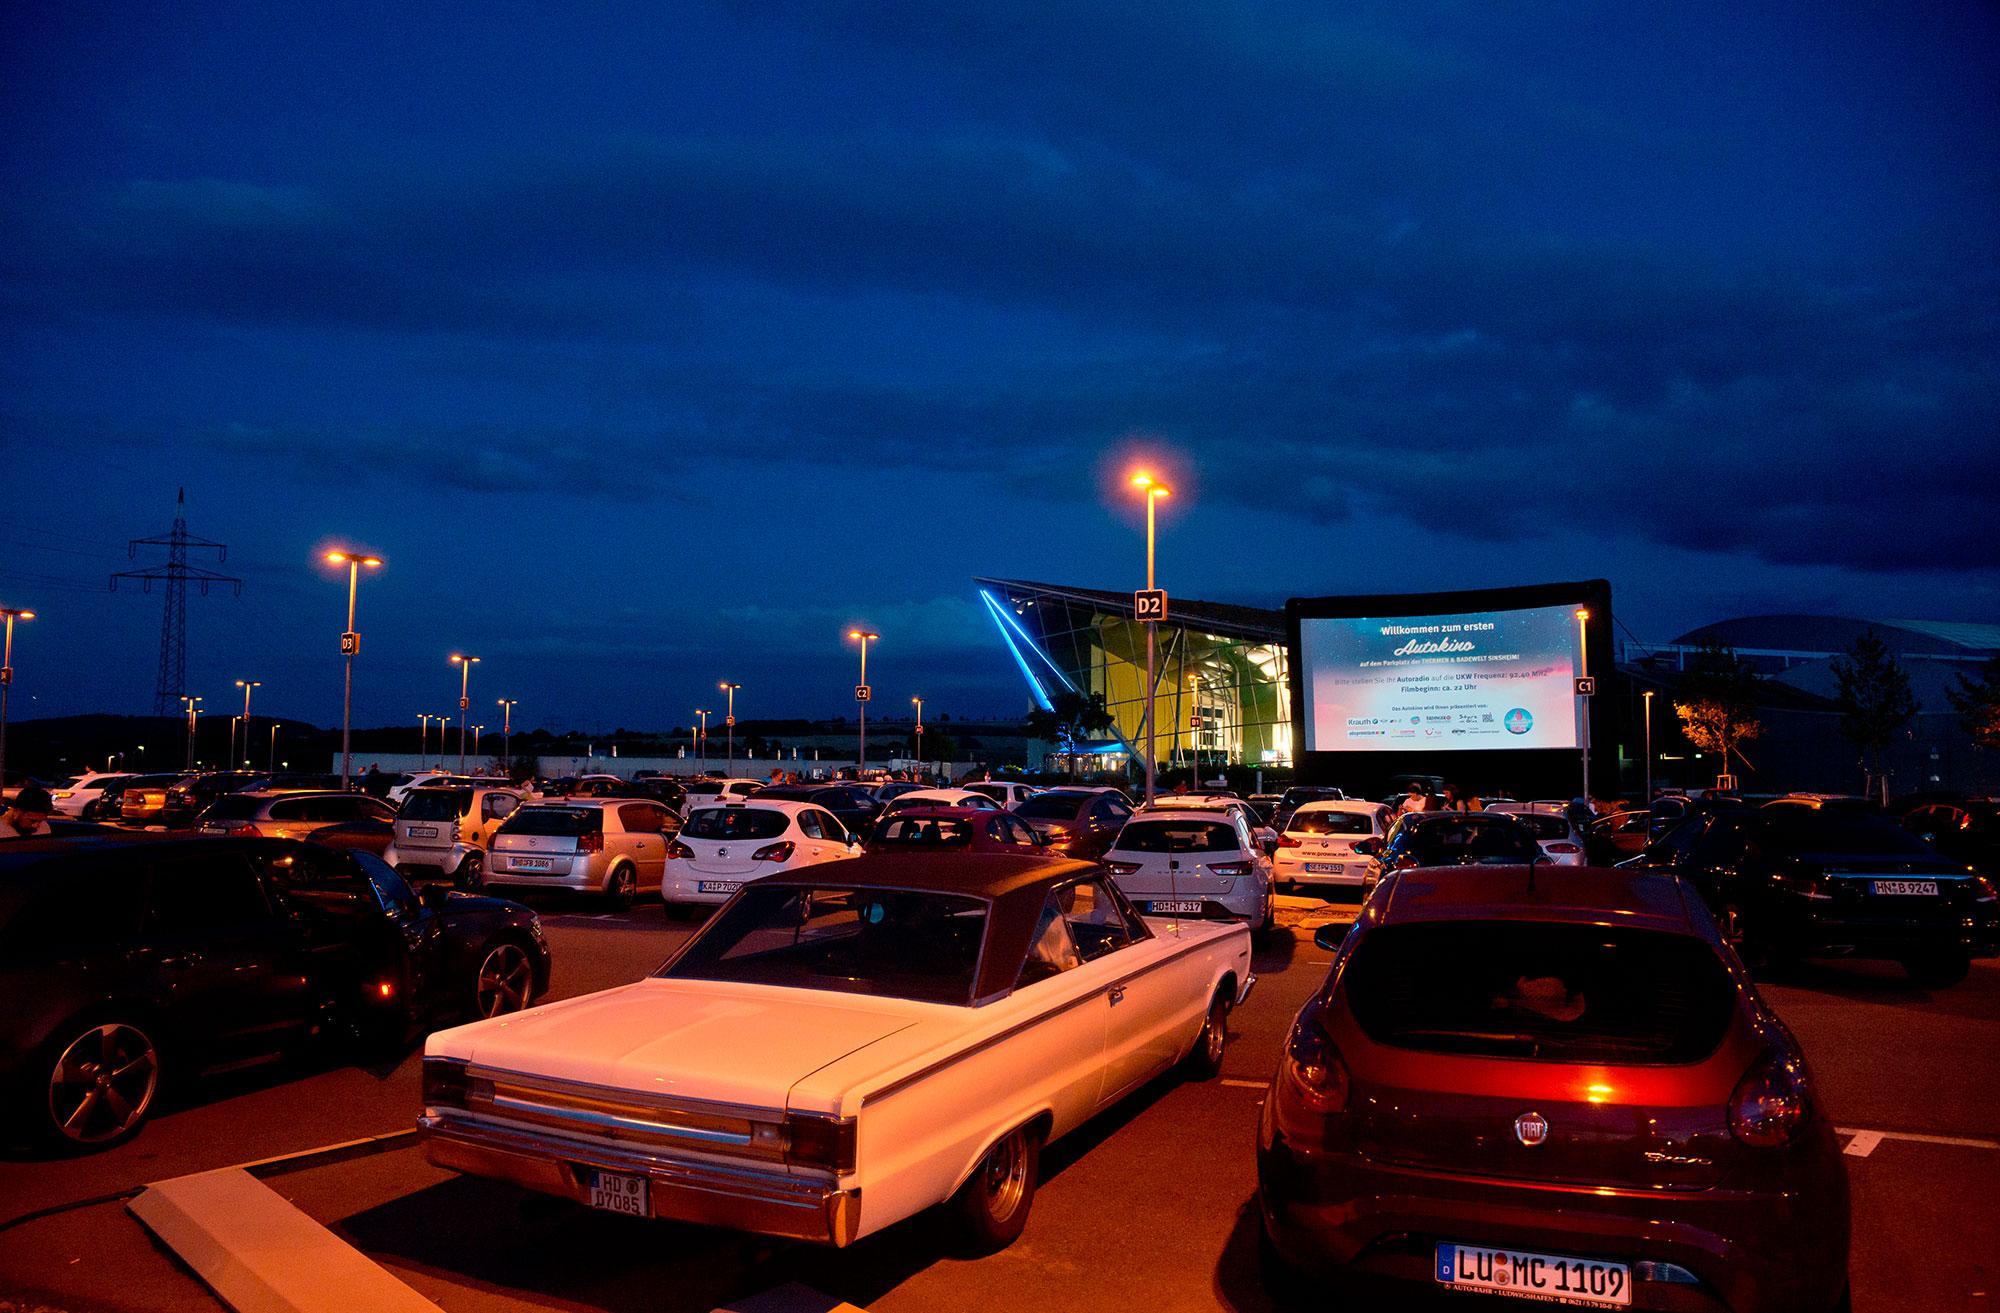 Open Air Kino Sinsheim